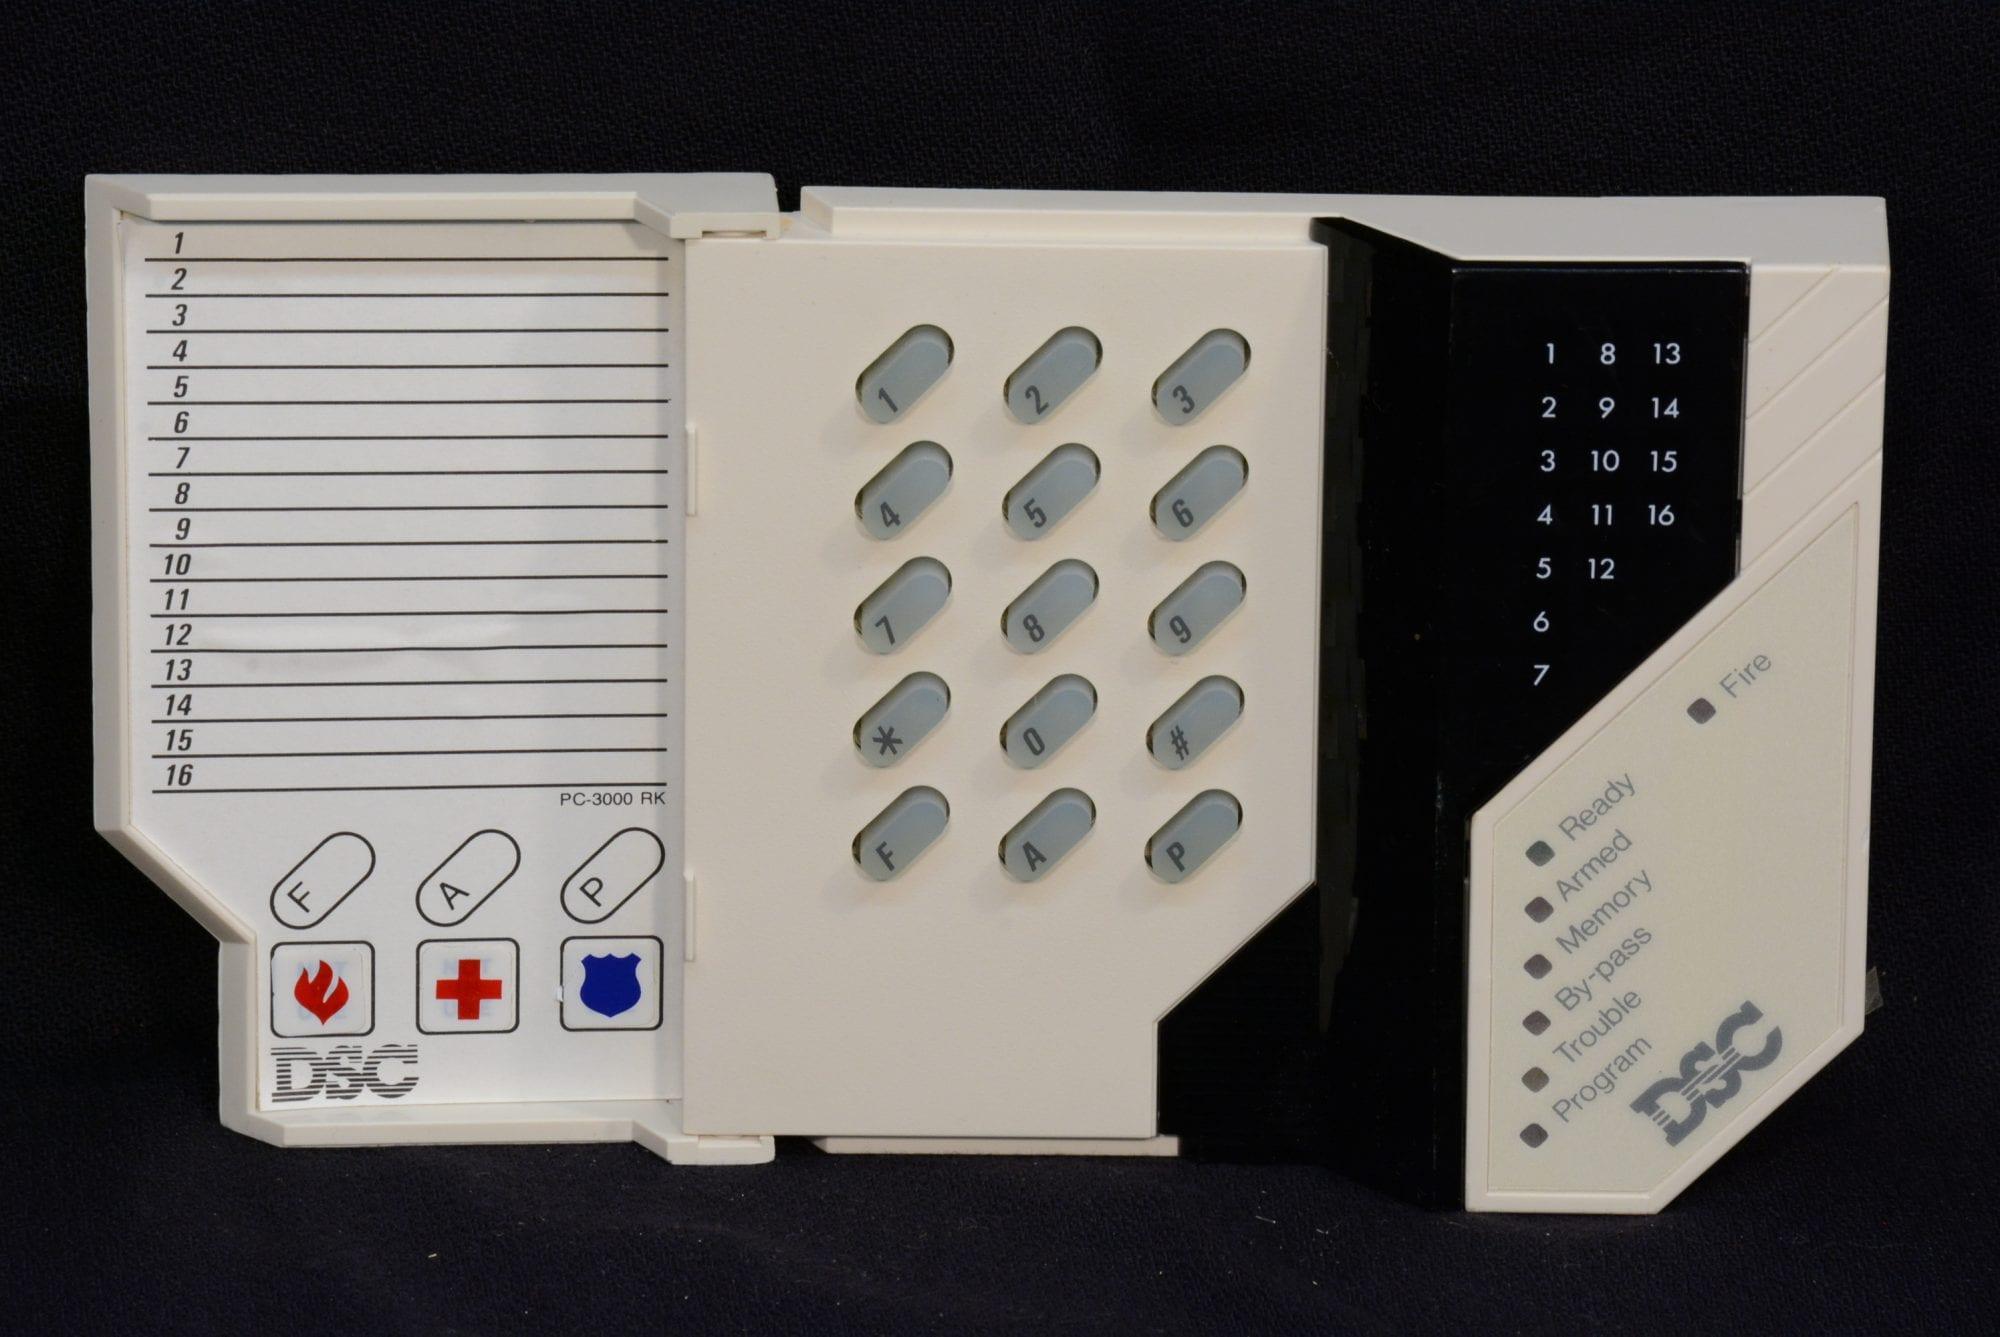 Dsc Pc3000 User Manual Various Owner Guide 5010 Wiring Diagram 16 Zone Led Keypad Wayne Alarm Systems Rh Waynealarm Com 3000 Installation Manuals